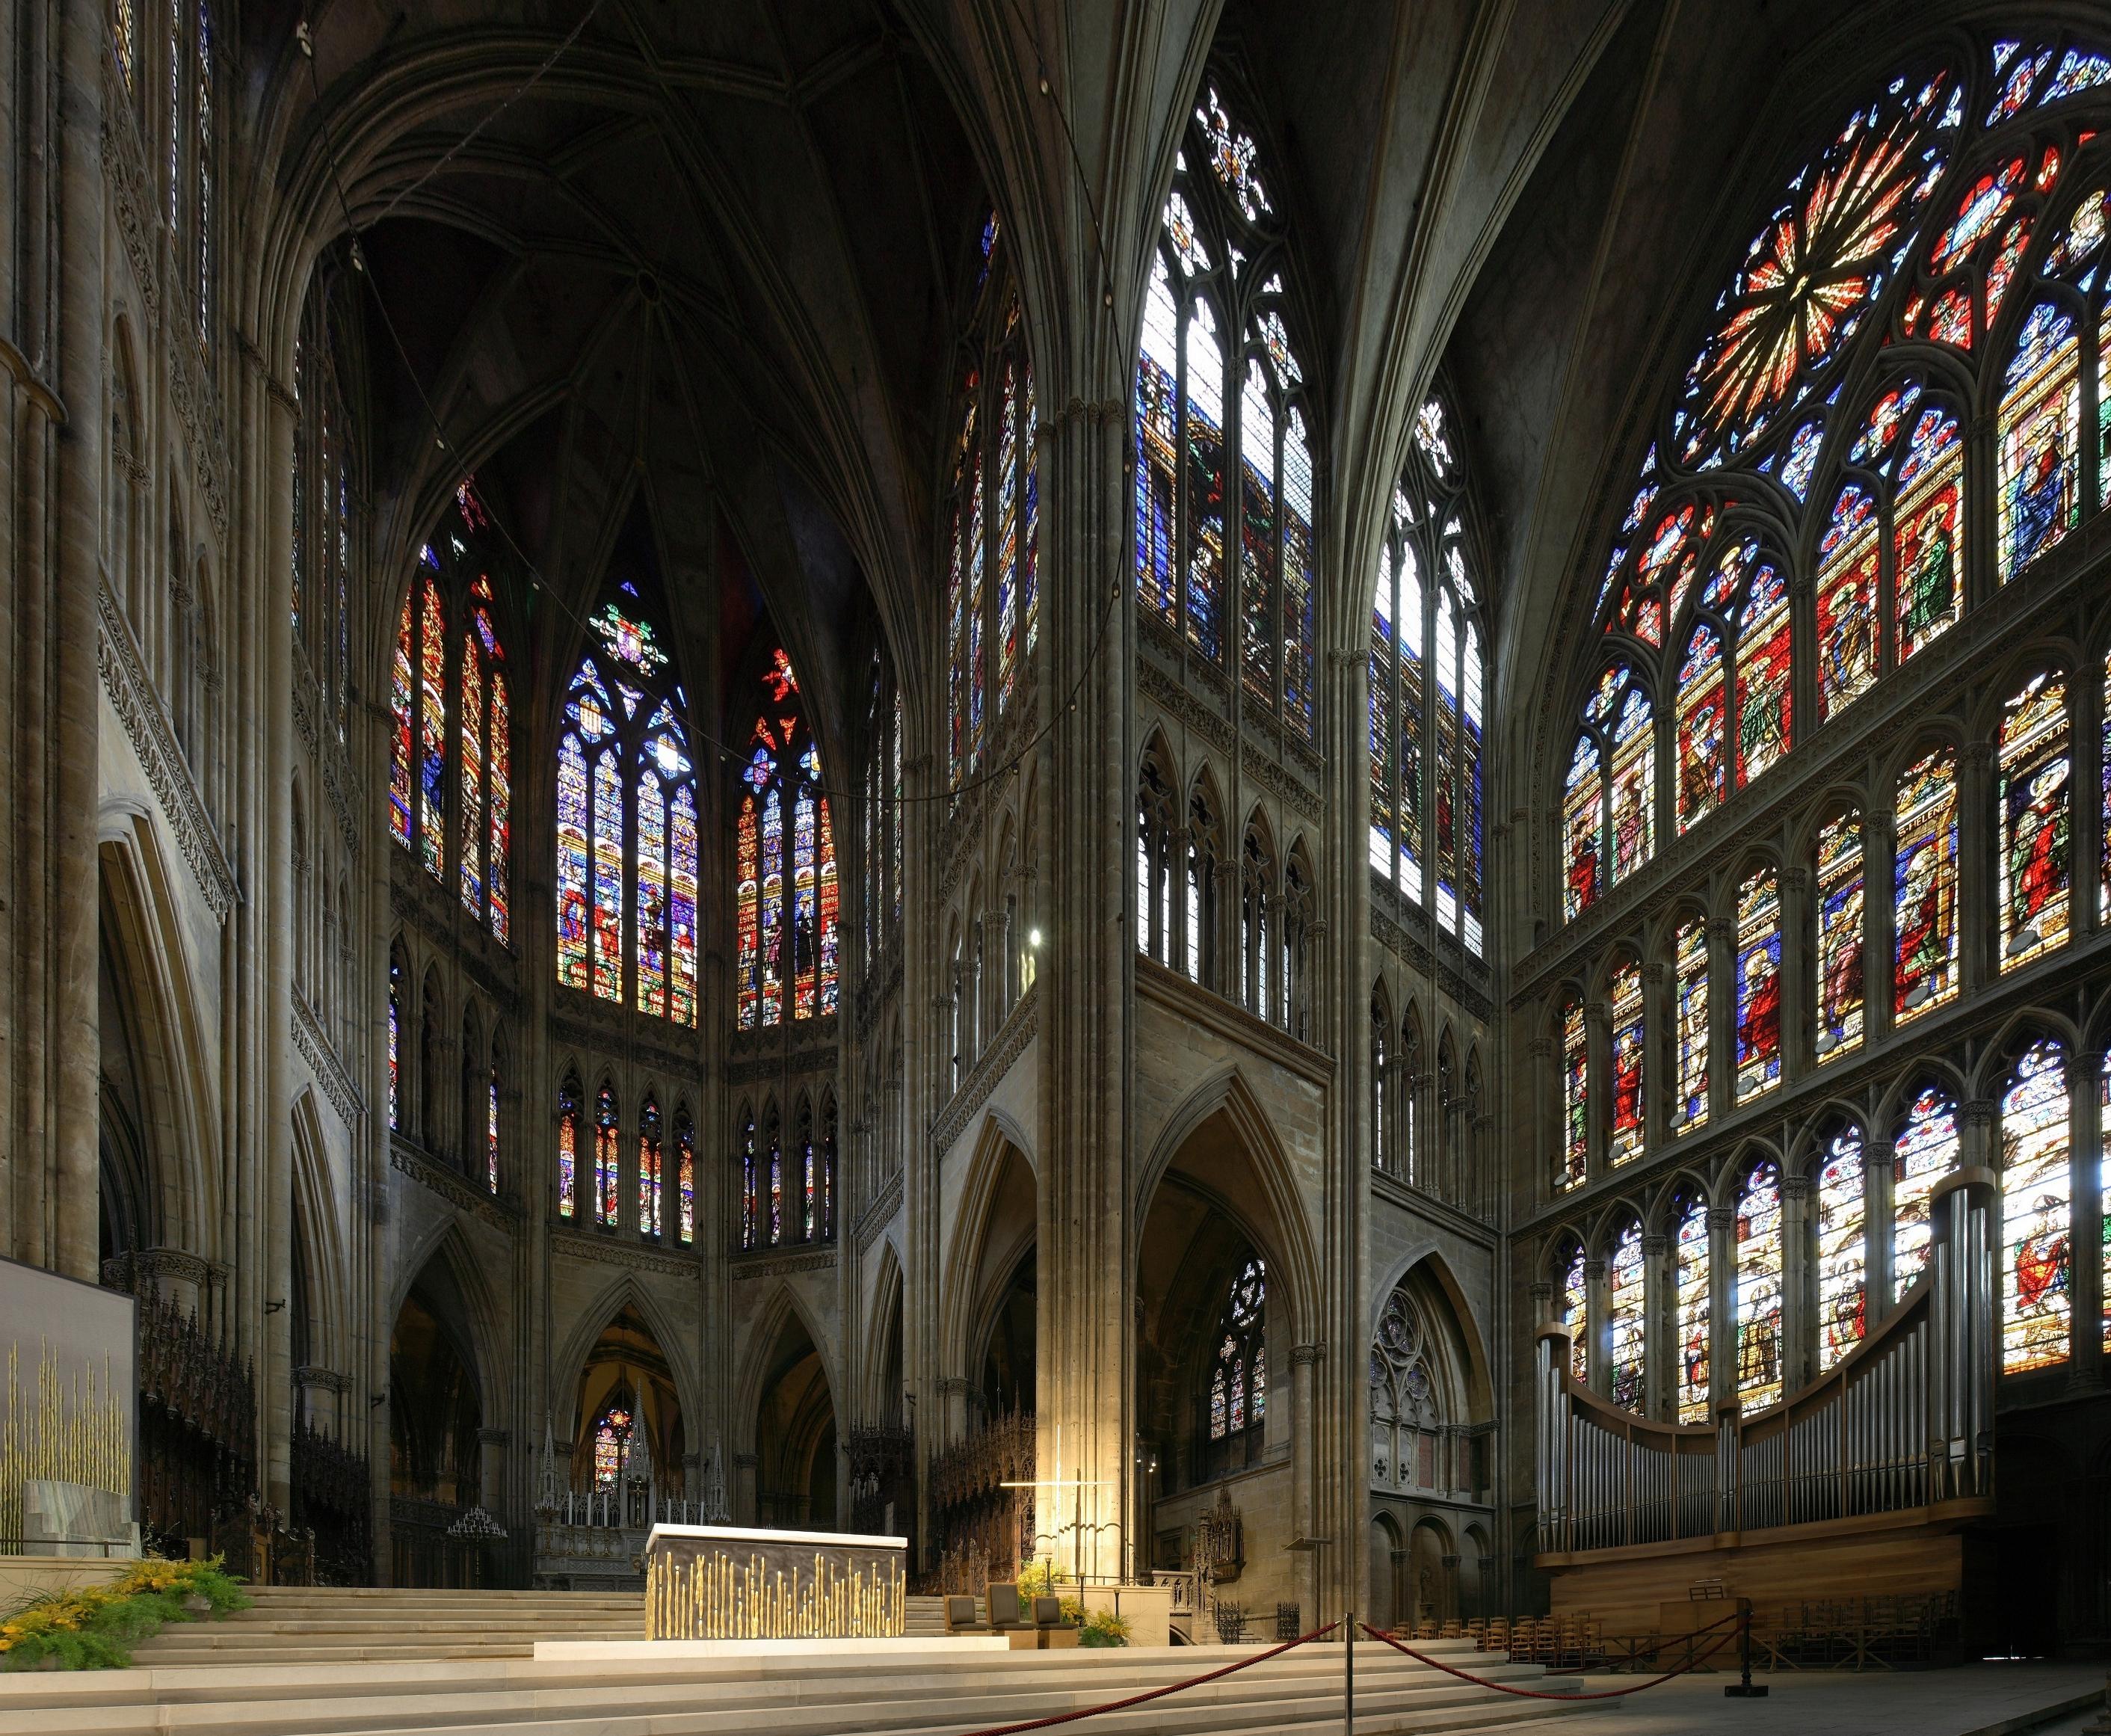 Vitraux Metz file:vitraux cathedrale metz - wikimedia commons